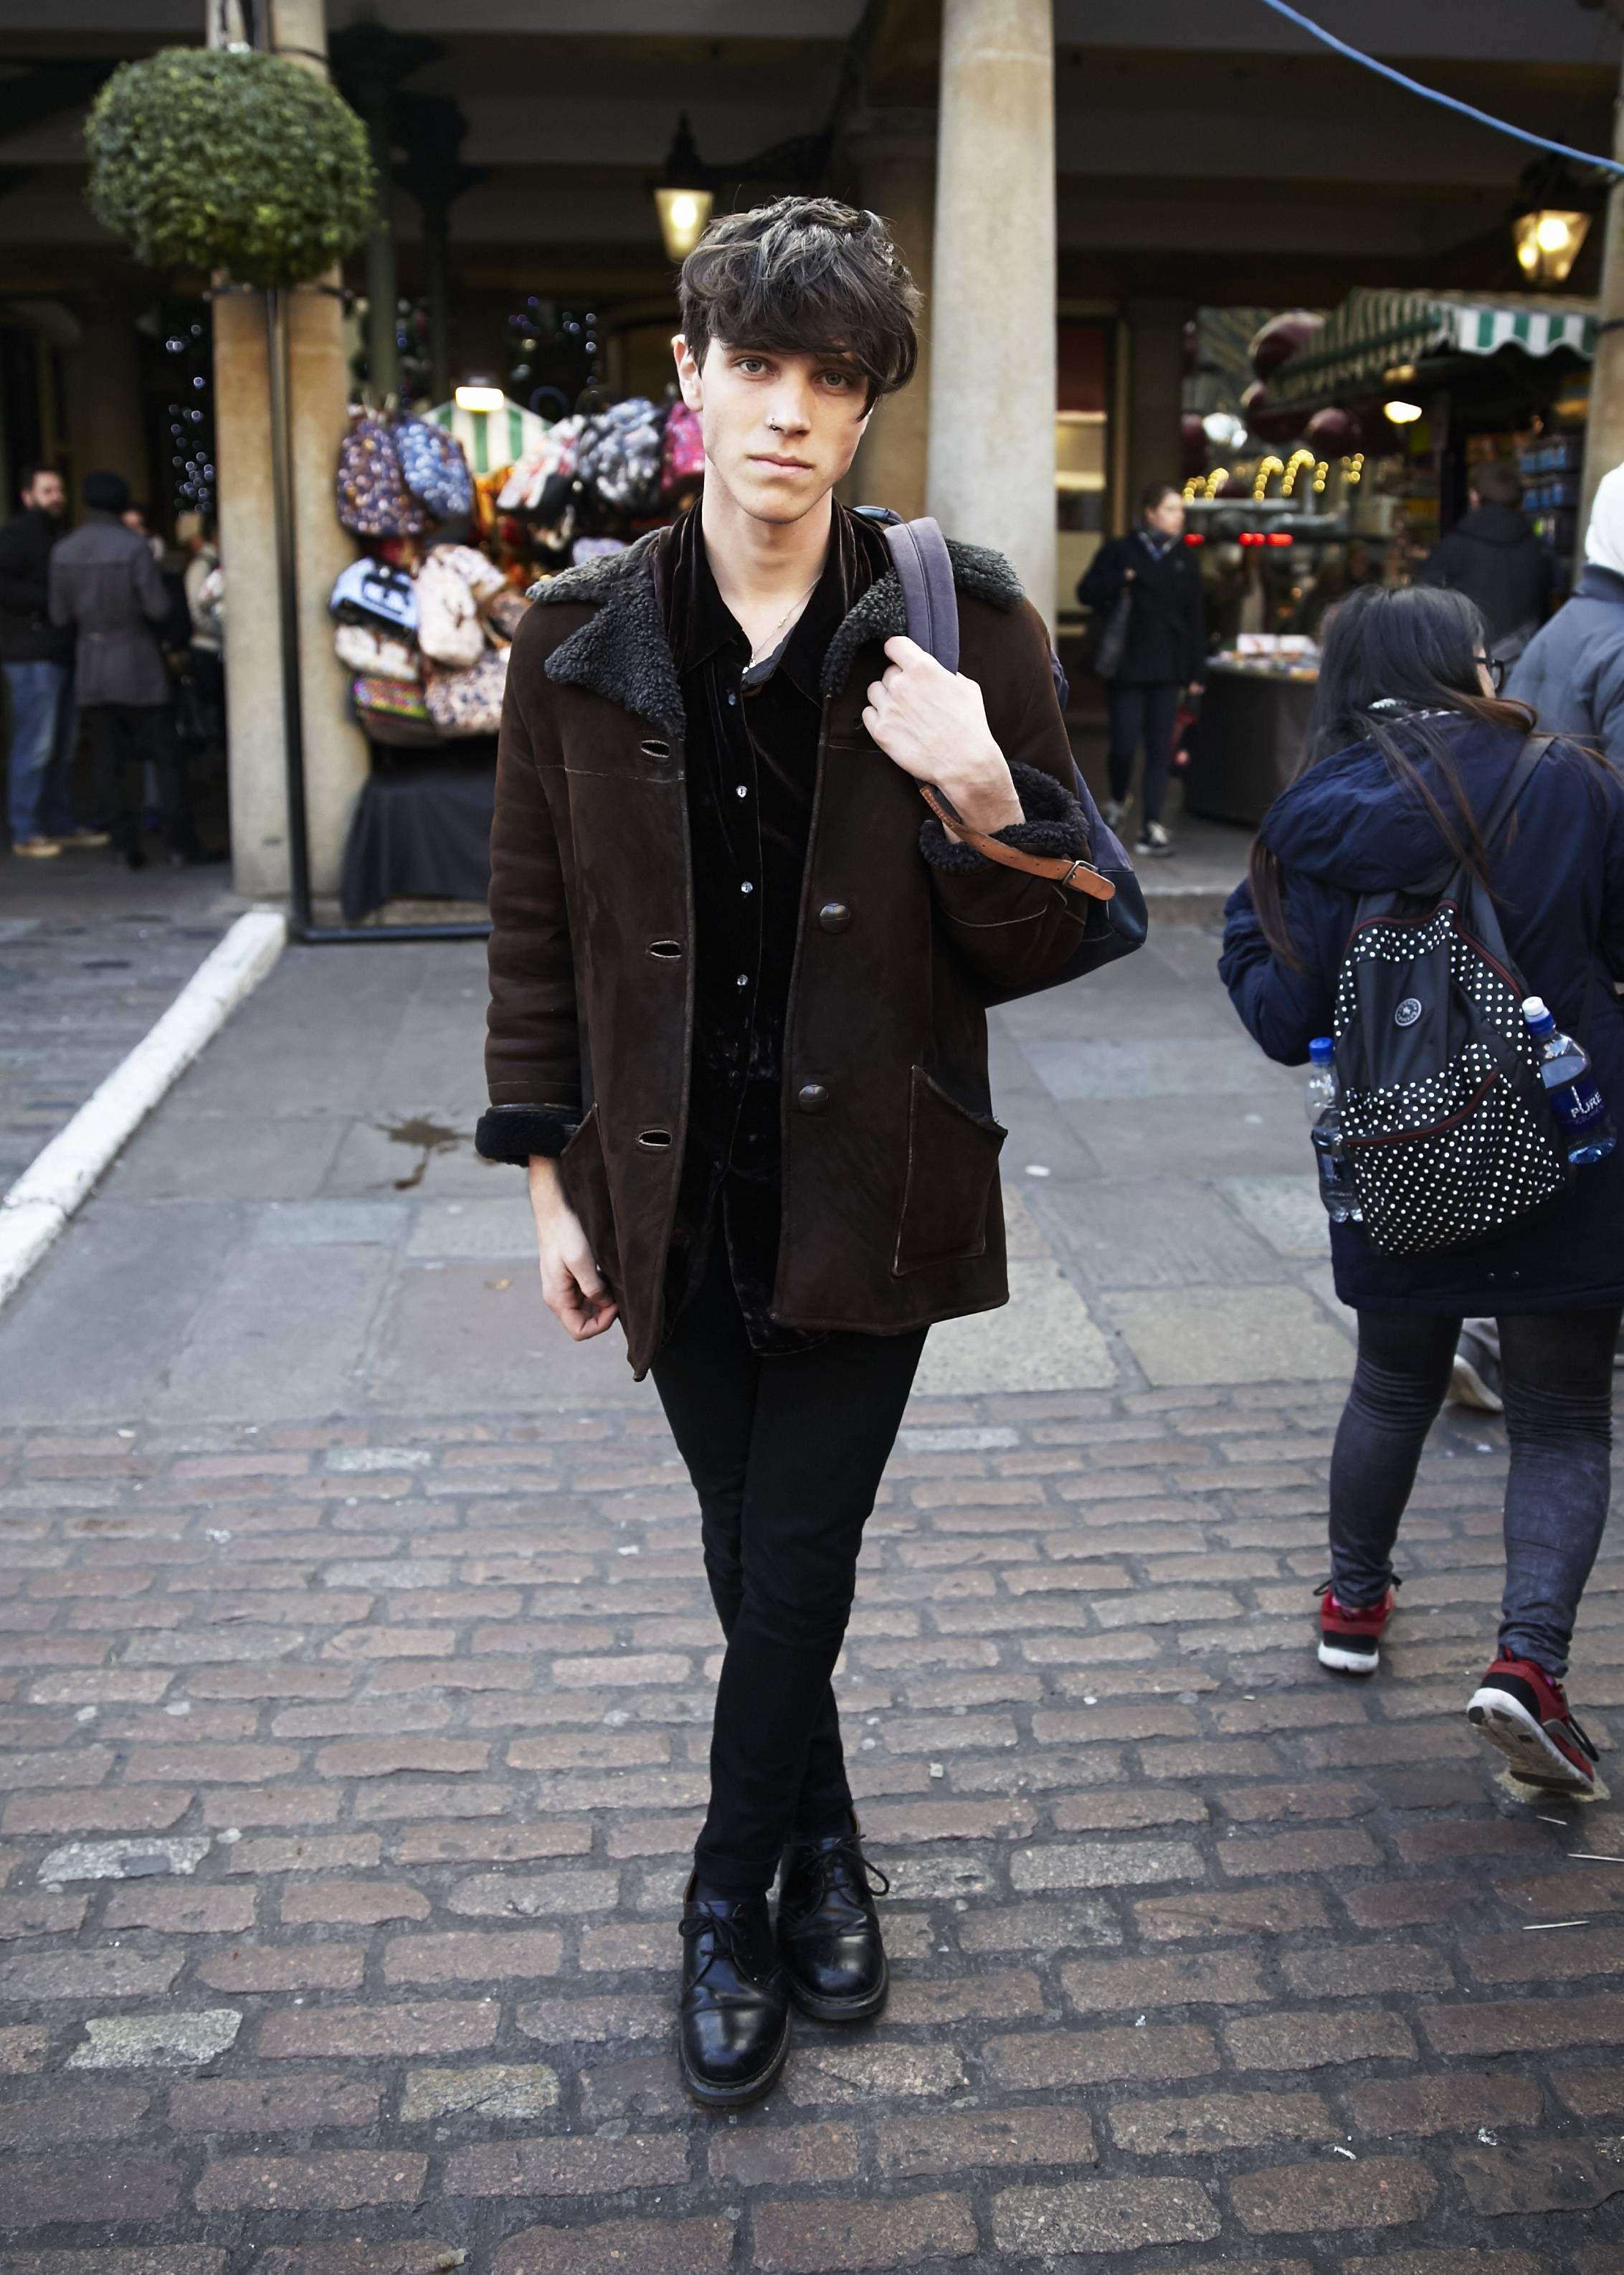 Men's London Street Style - December 2014